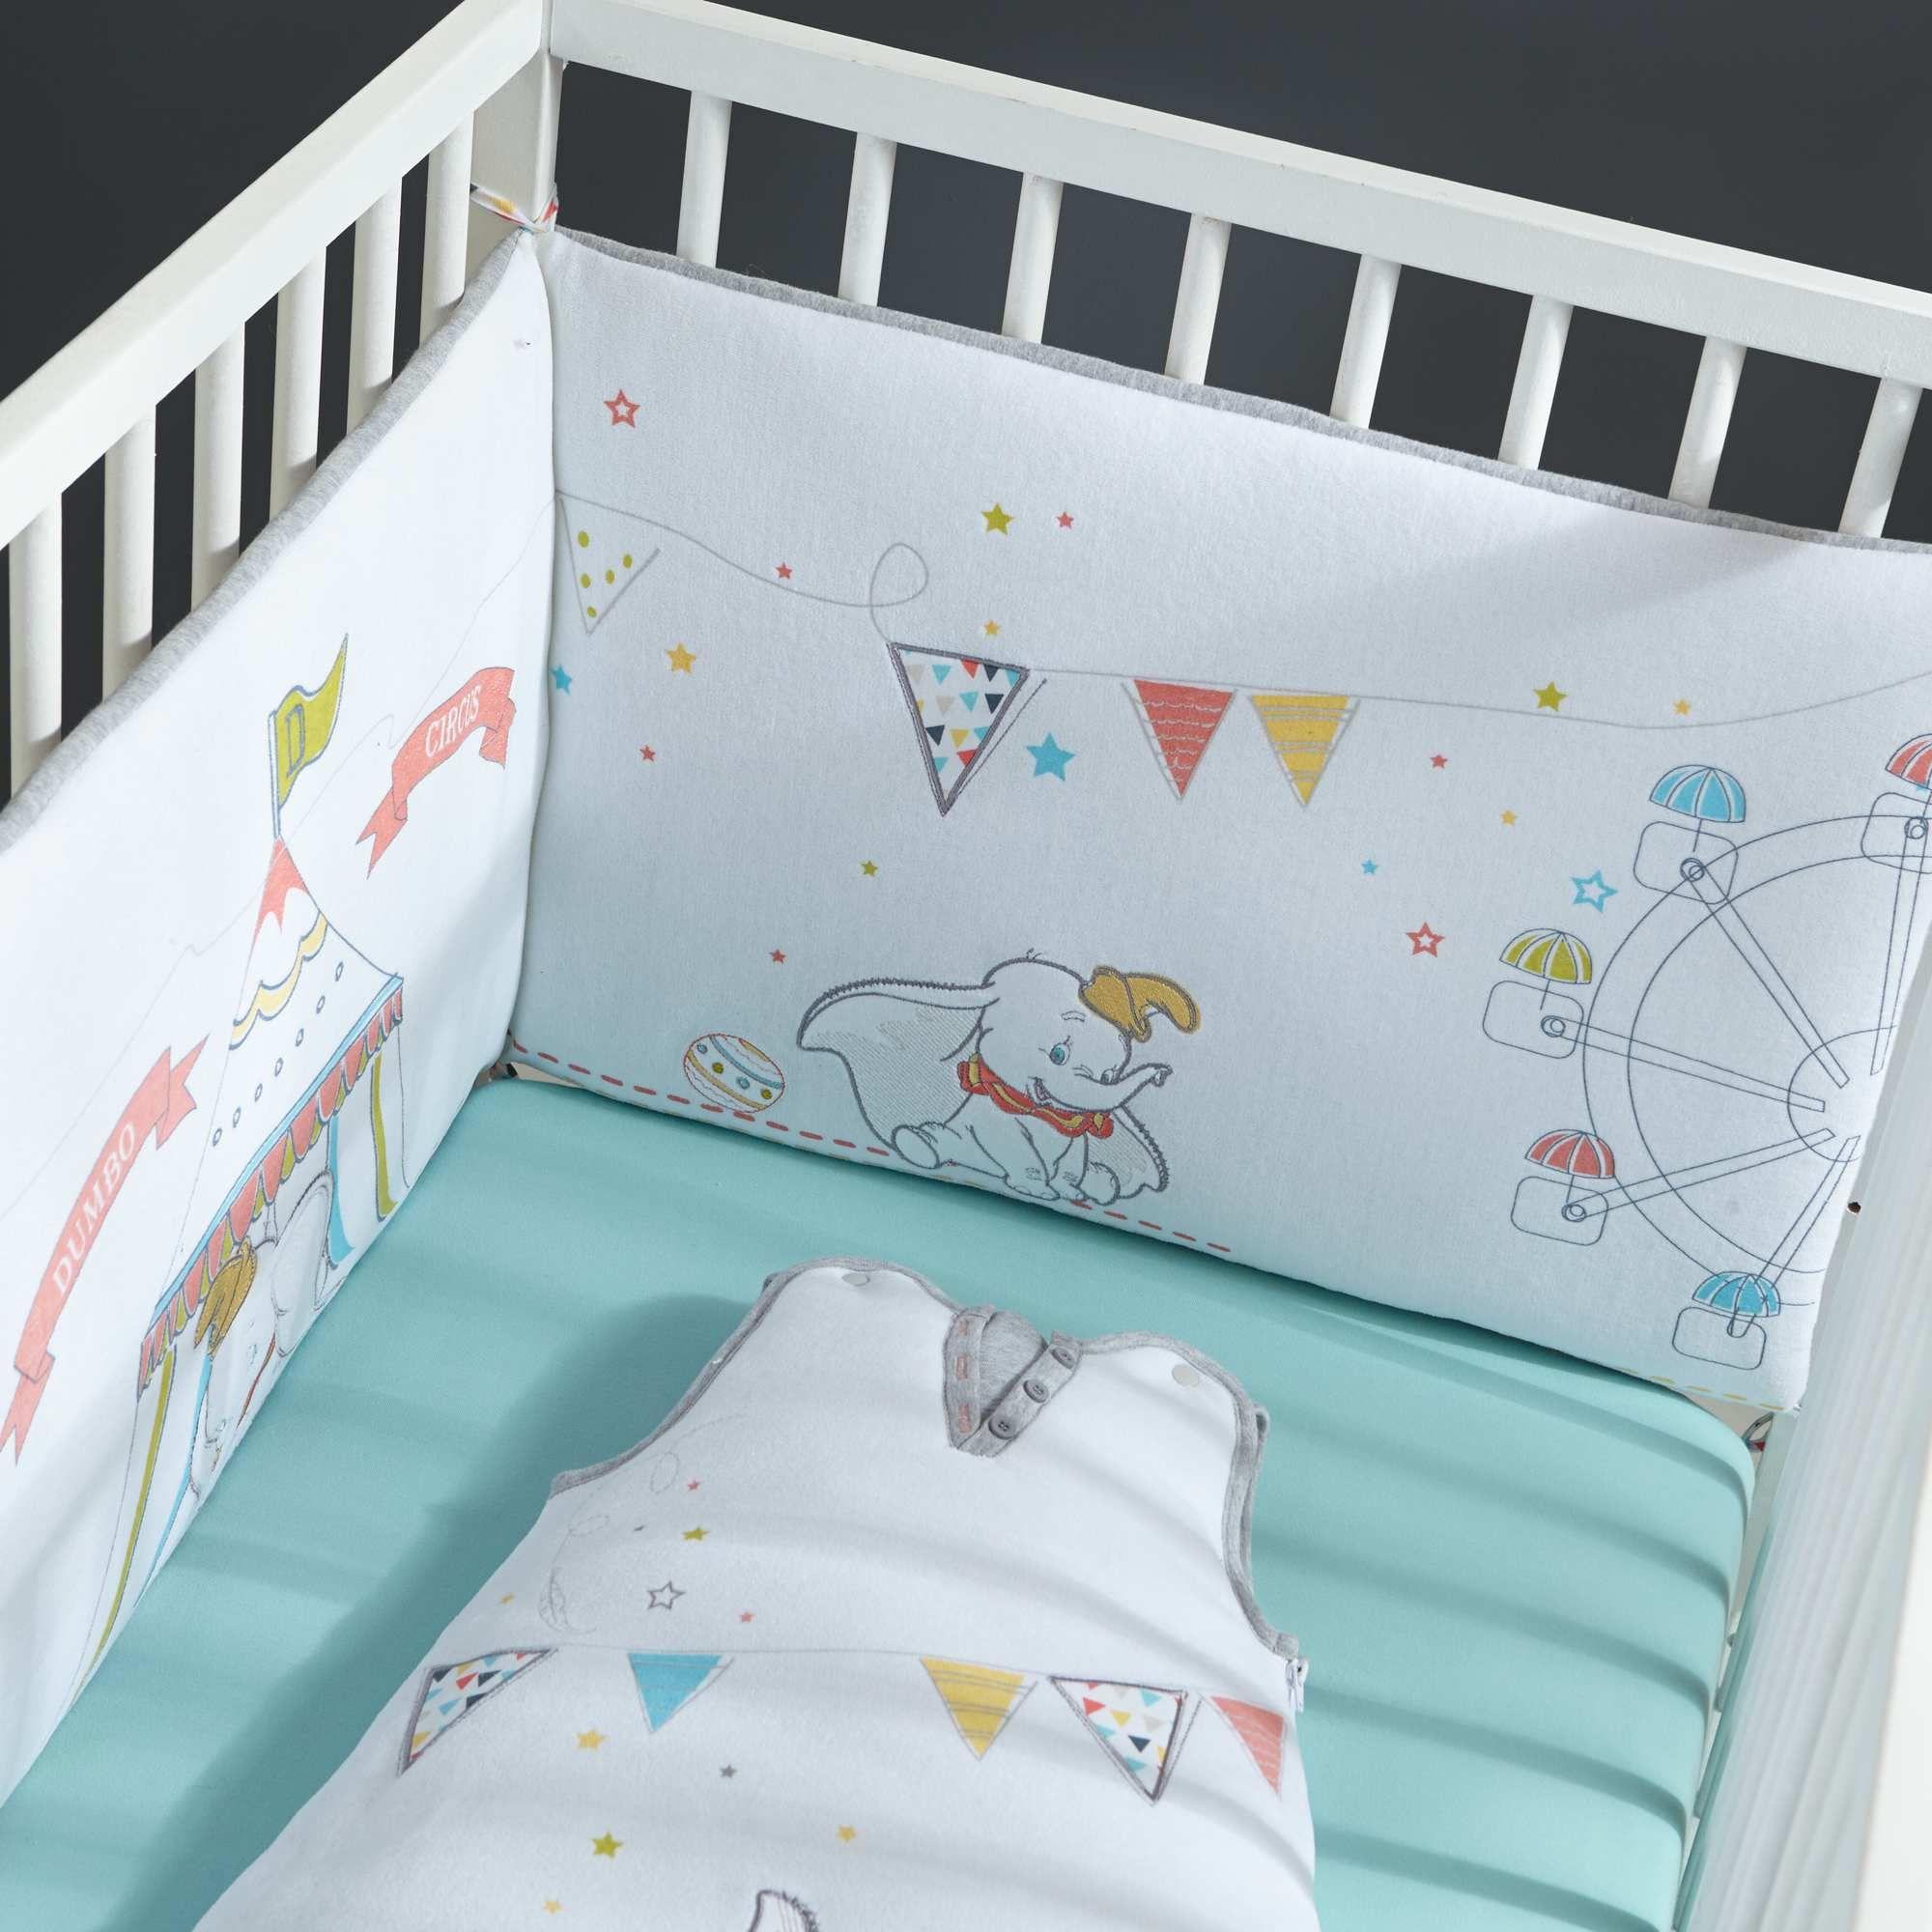 tour de lit bébé garçon disney chambre dumbo   Recherche Google | Dumbo kid's room | Pinterest  tour de lit bébé garçon disney